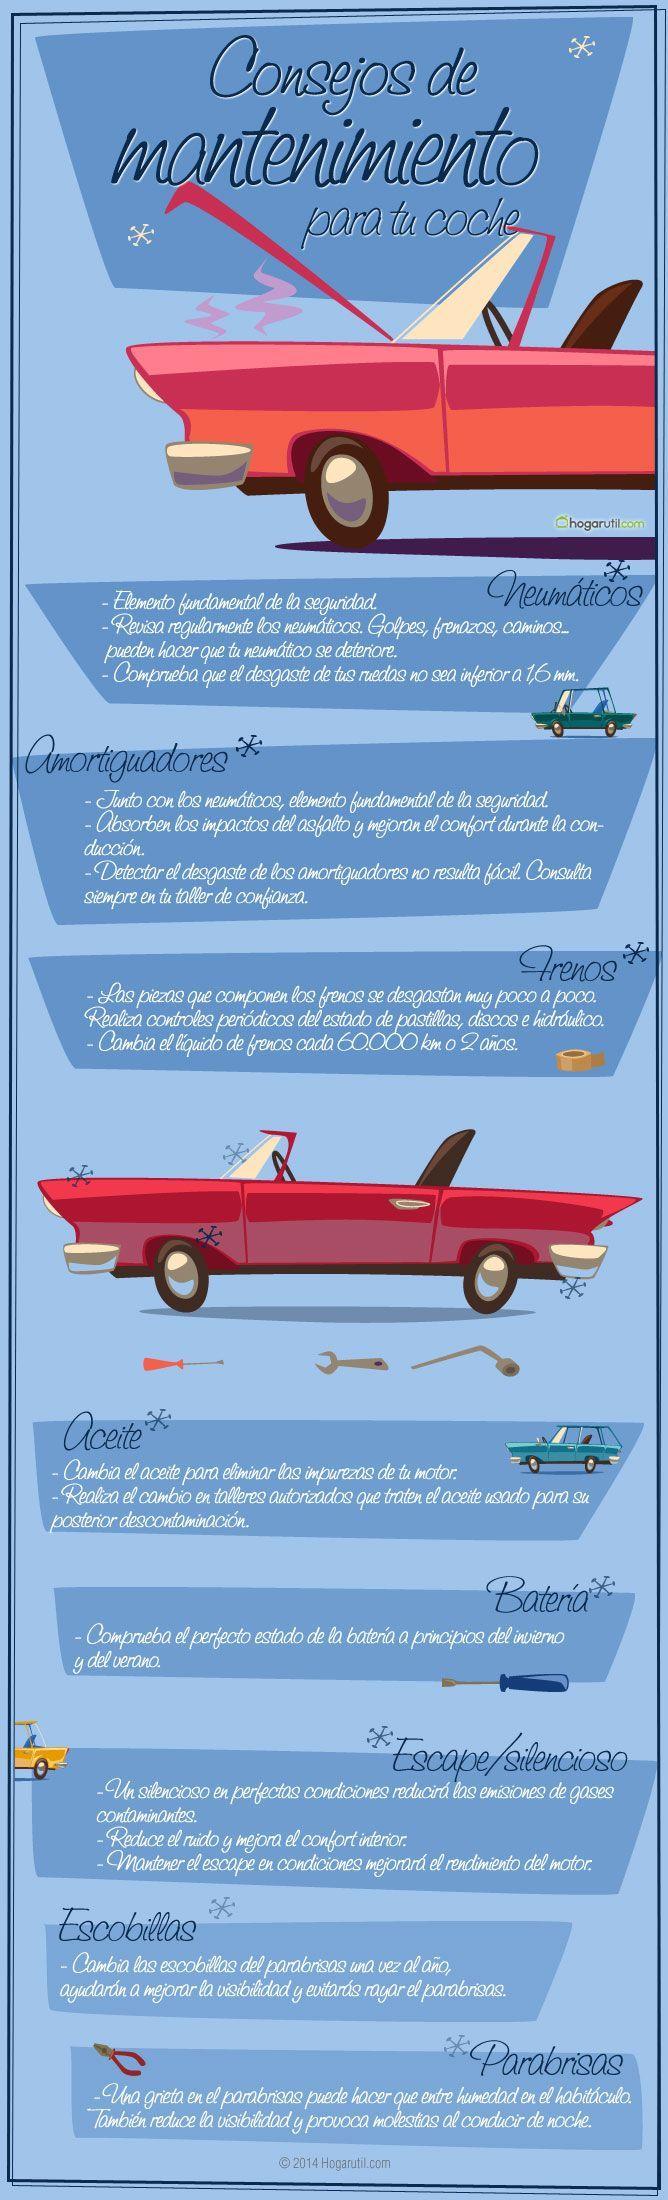 Infografía con consejos de mantenimiento para tu coche #infografia #coche